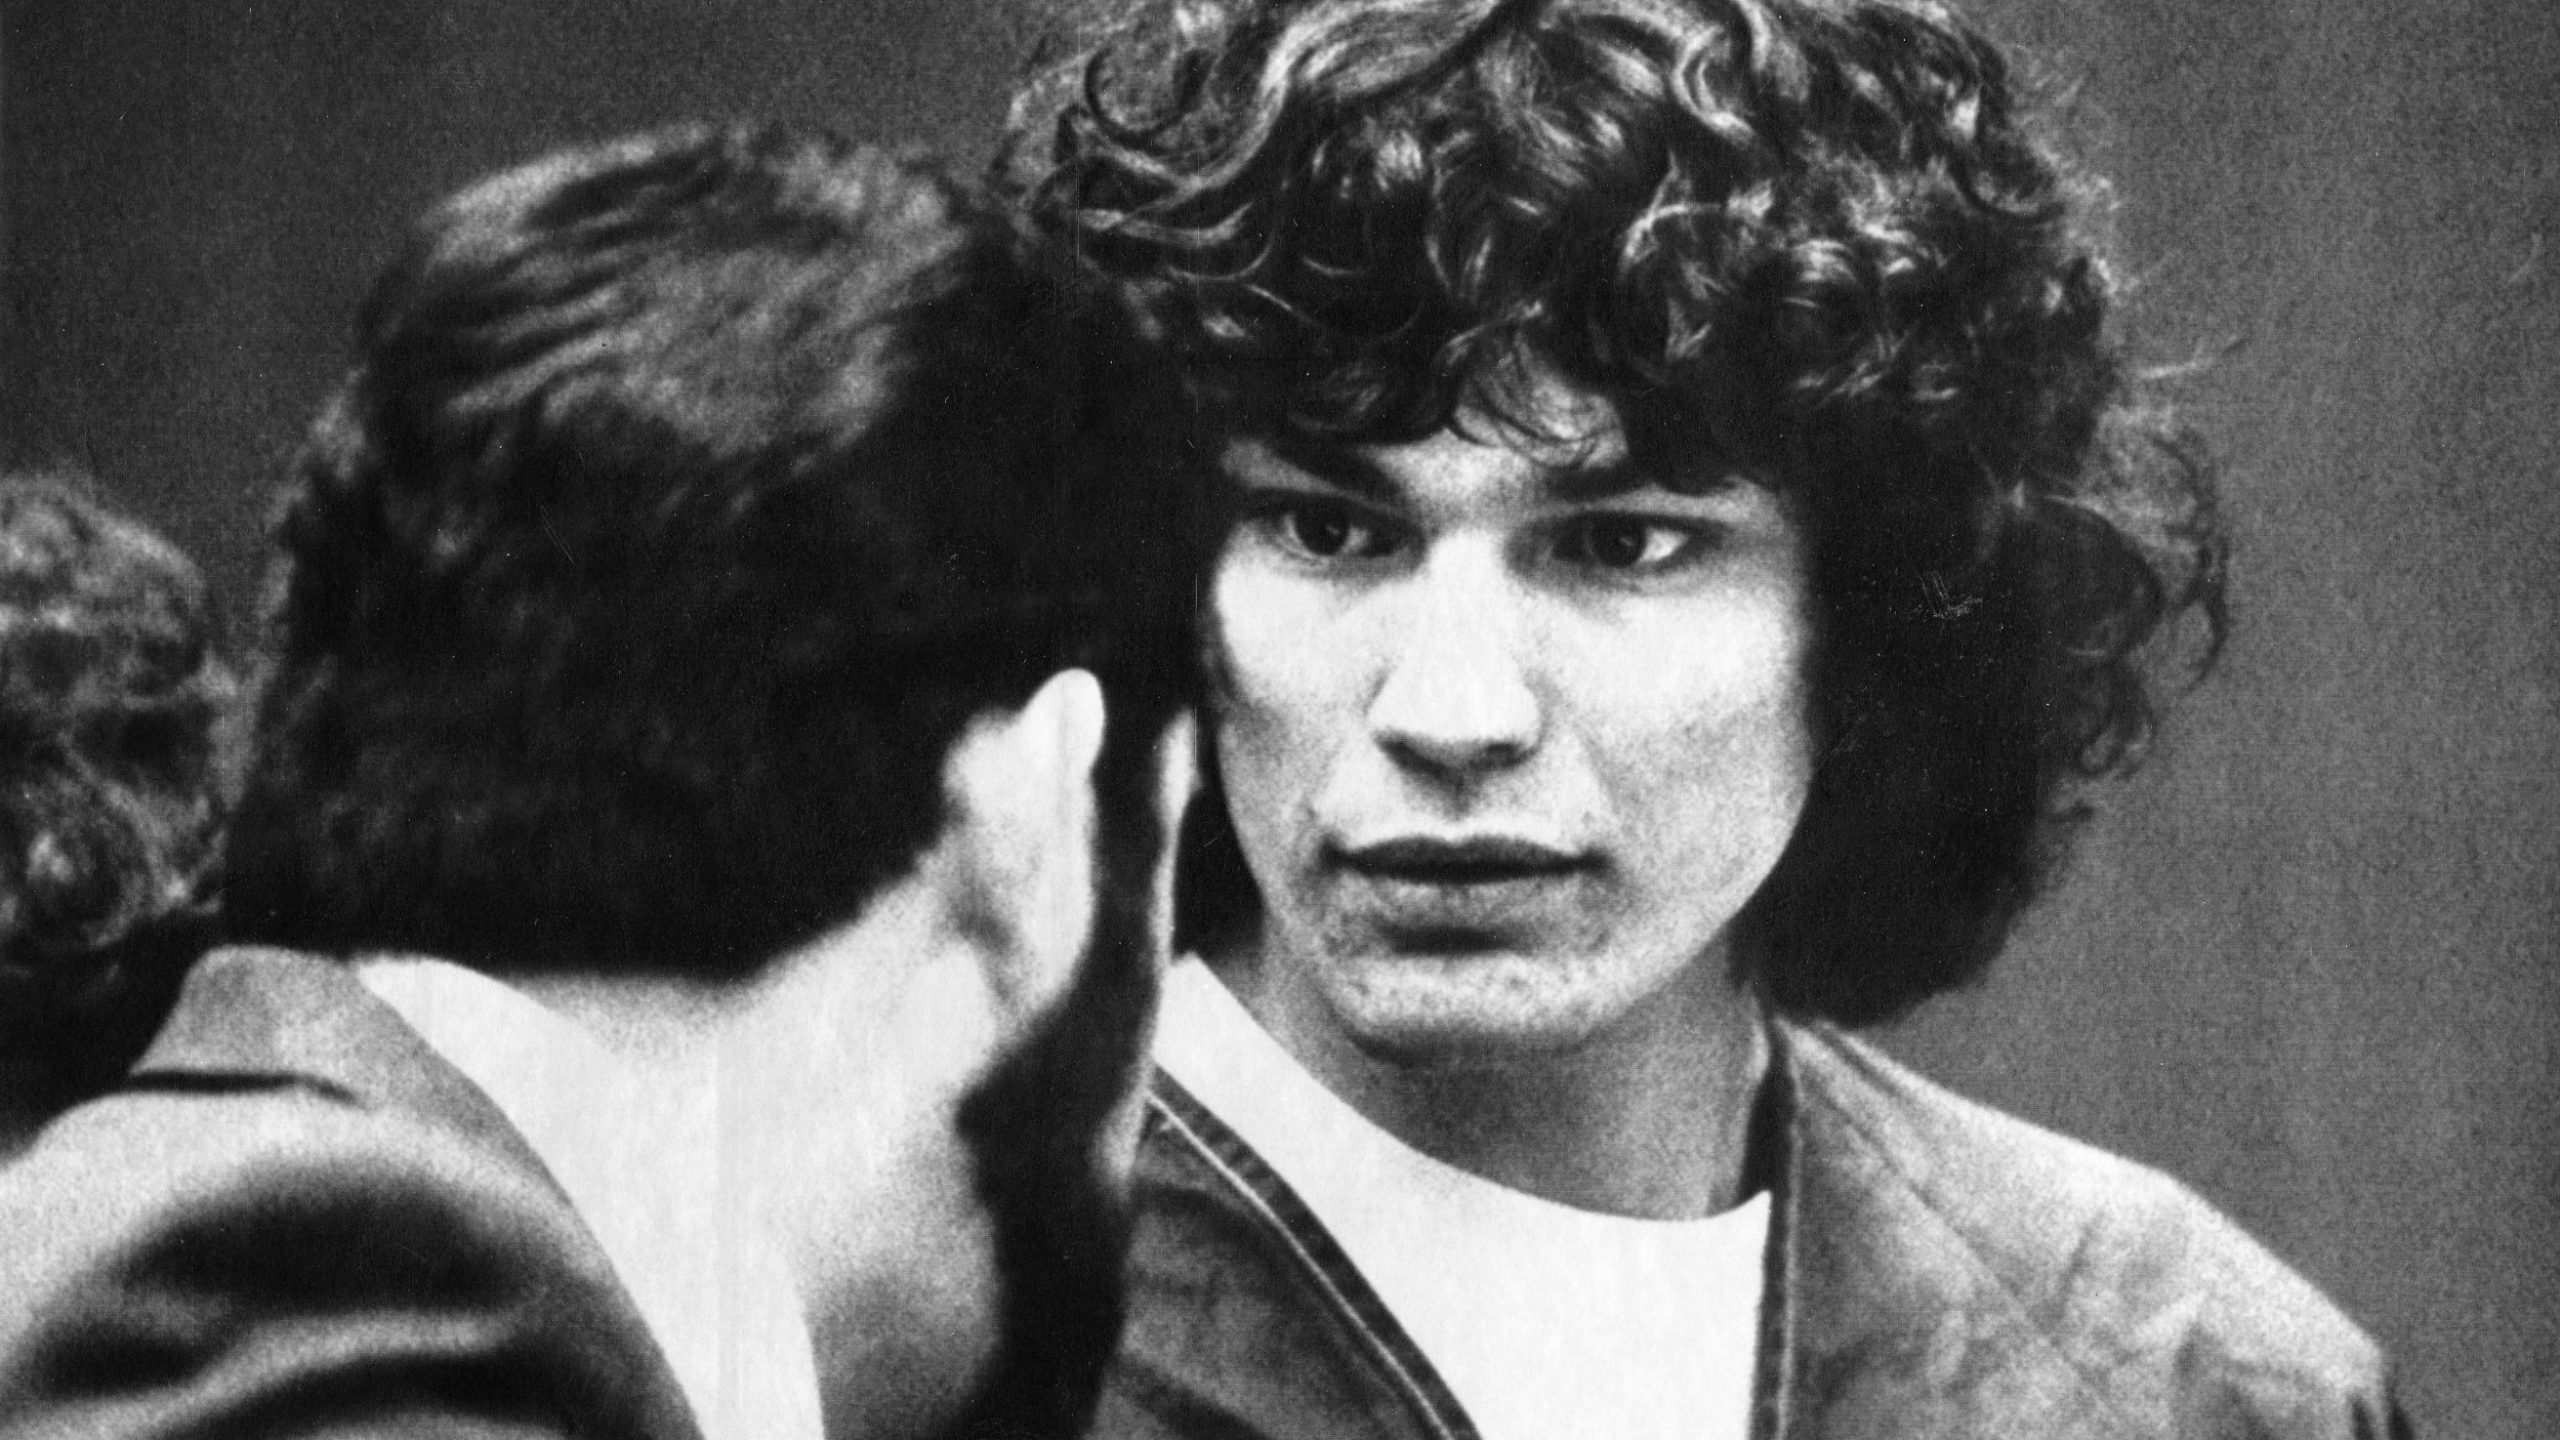 10 Serial Killer Documentaries to Watch if You've Seen Netflix's Night Stalker